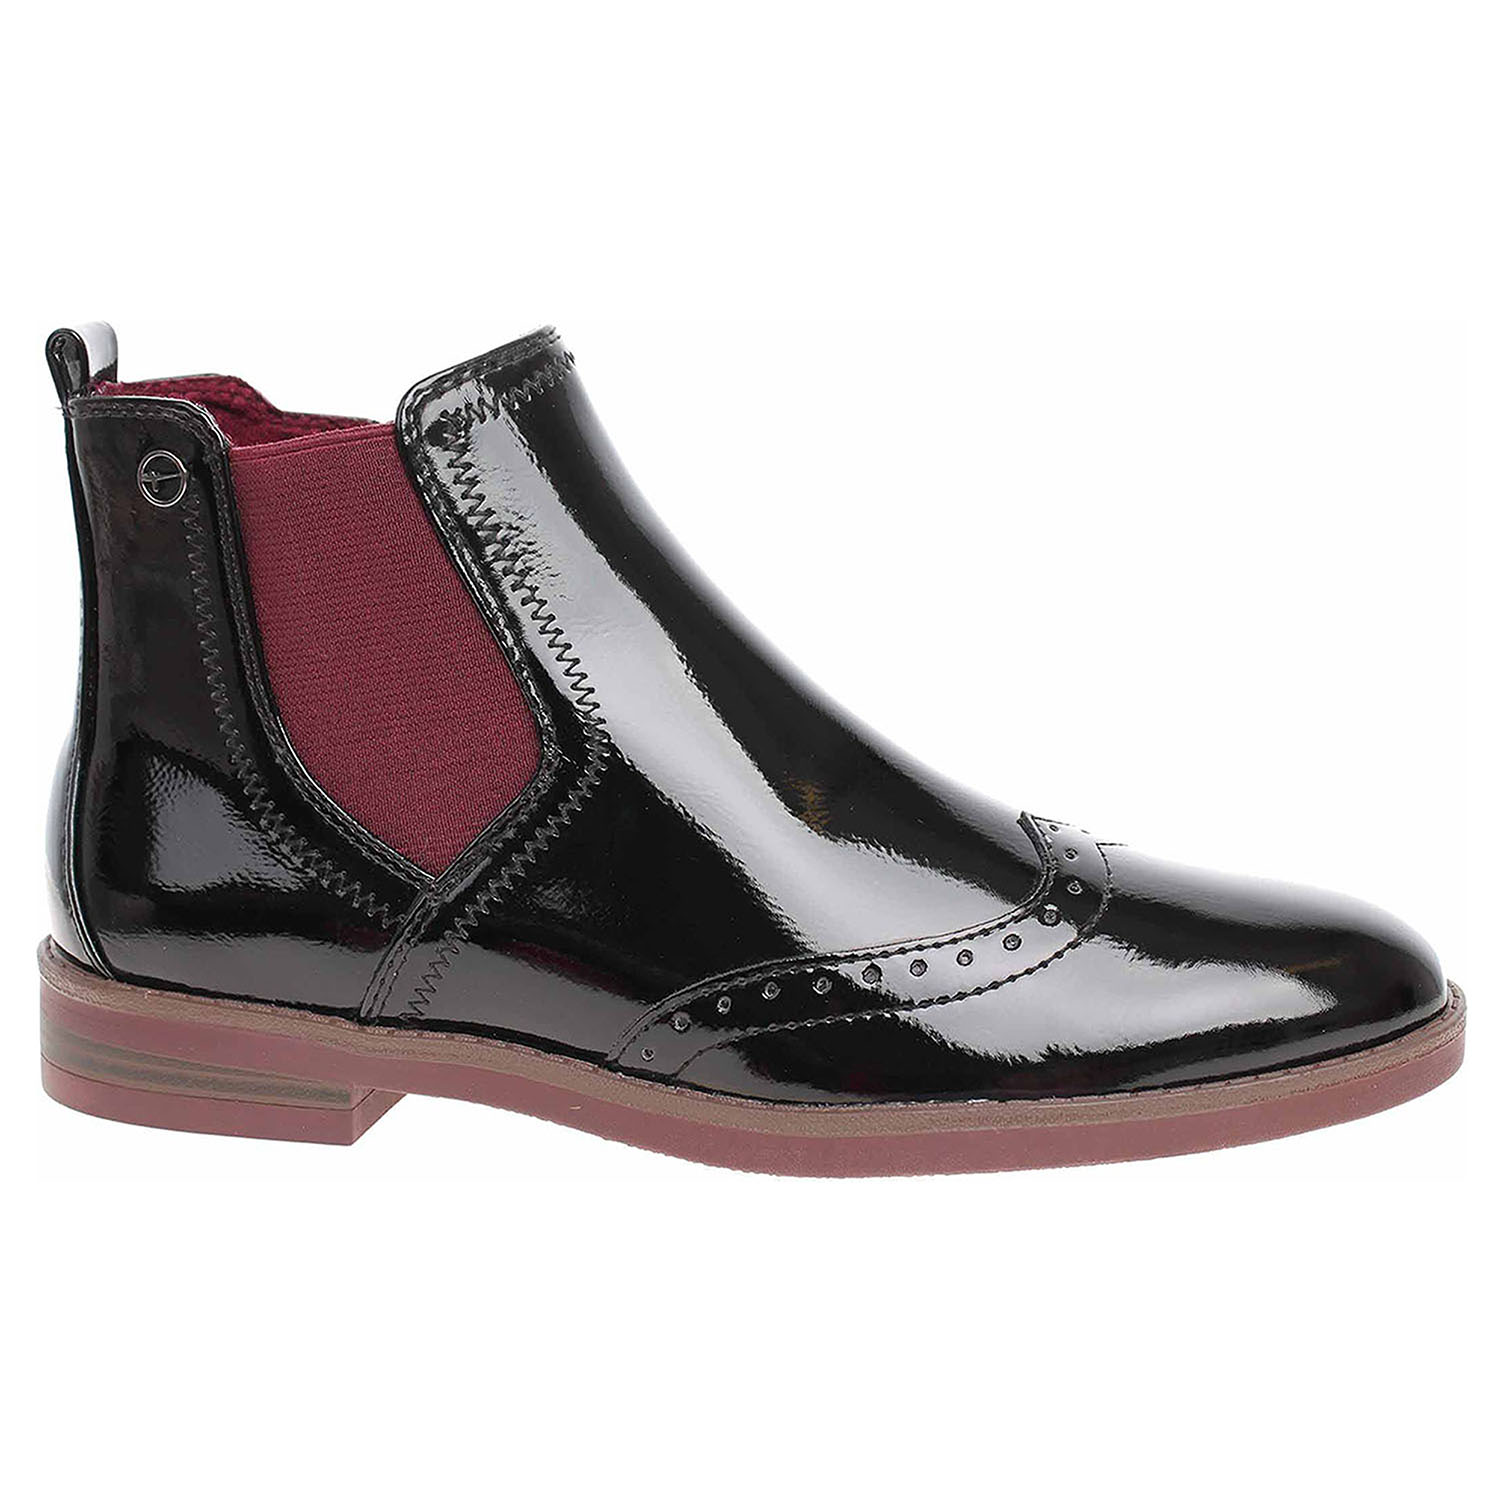 Dámská obuv Tamaris 1-25313-23 black patent 1-1-25313-23 018 40